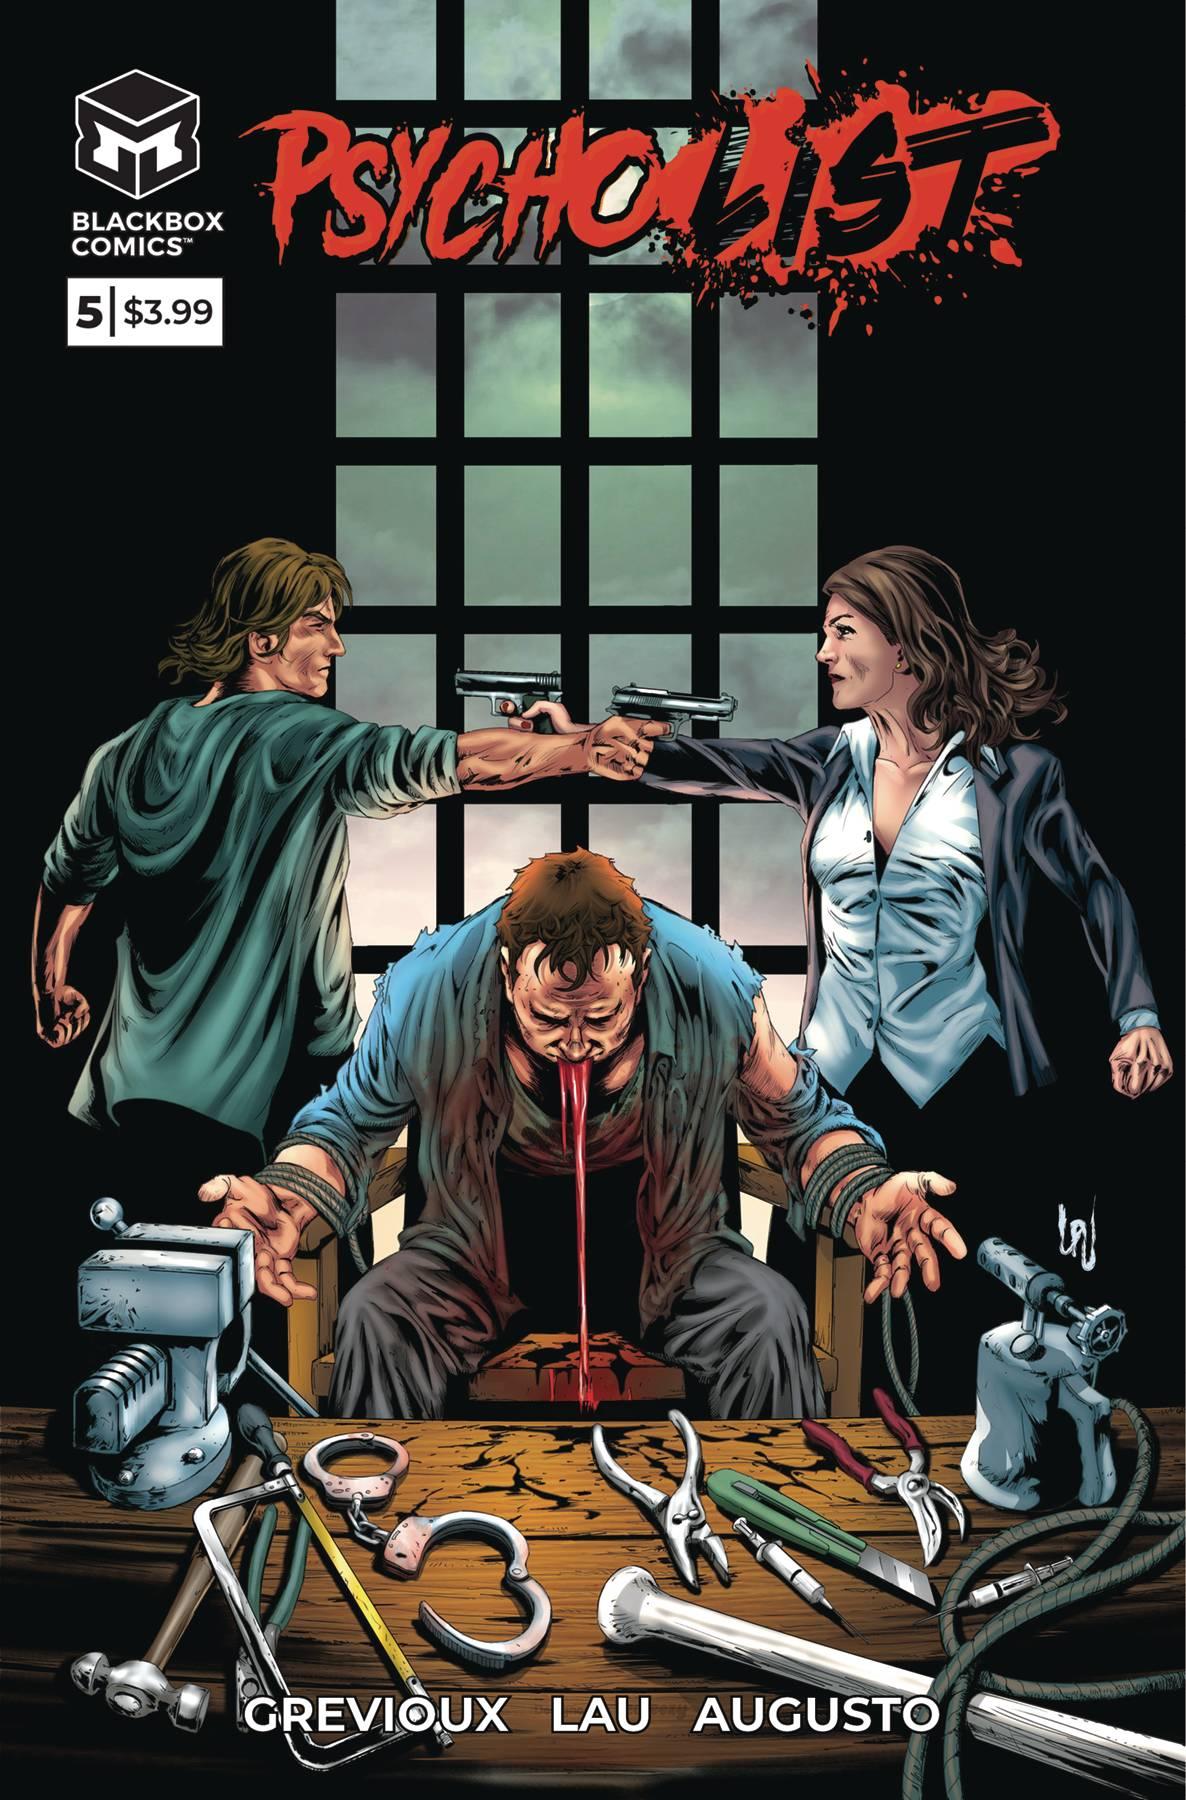 Psycho List #5 (2019)